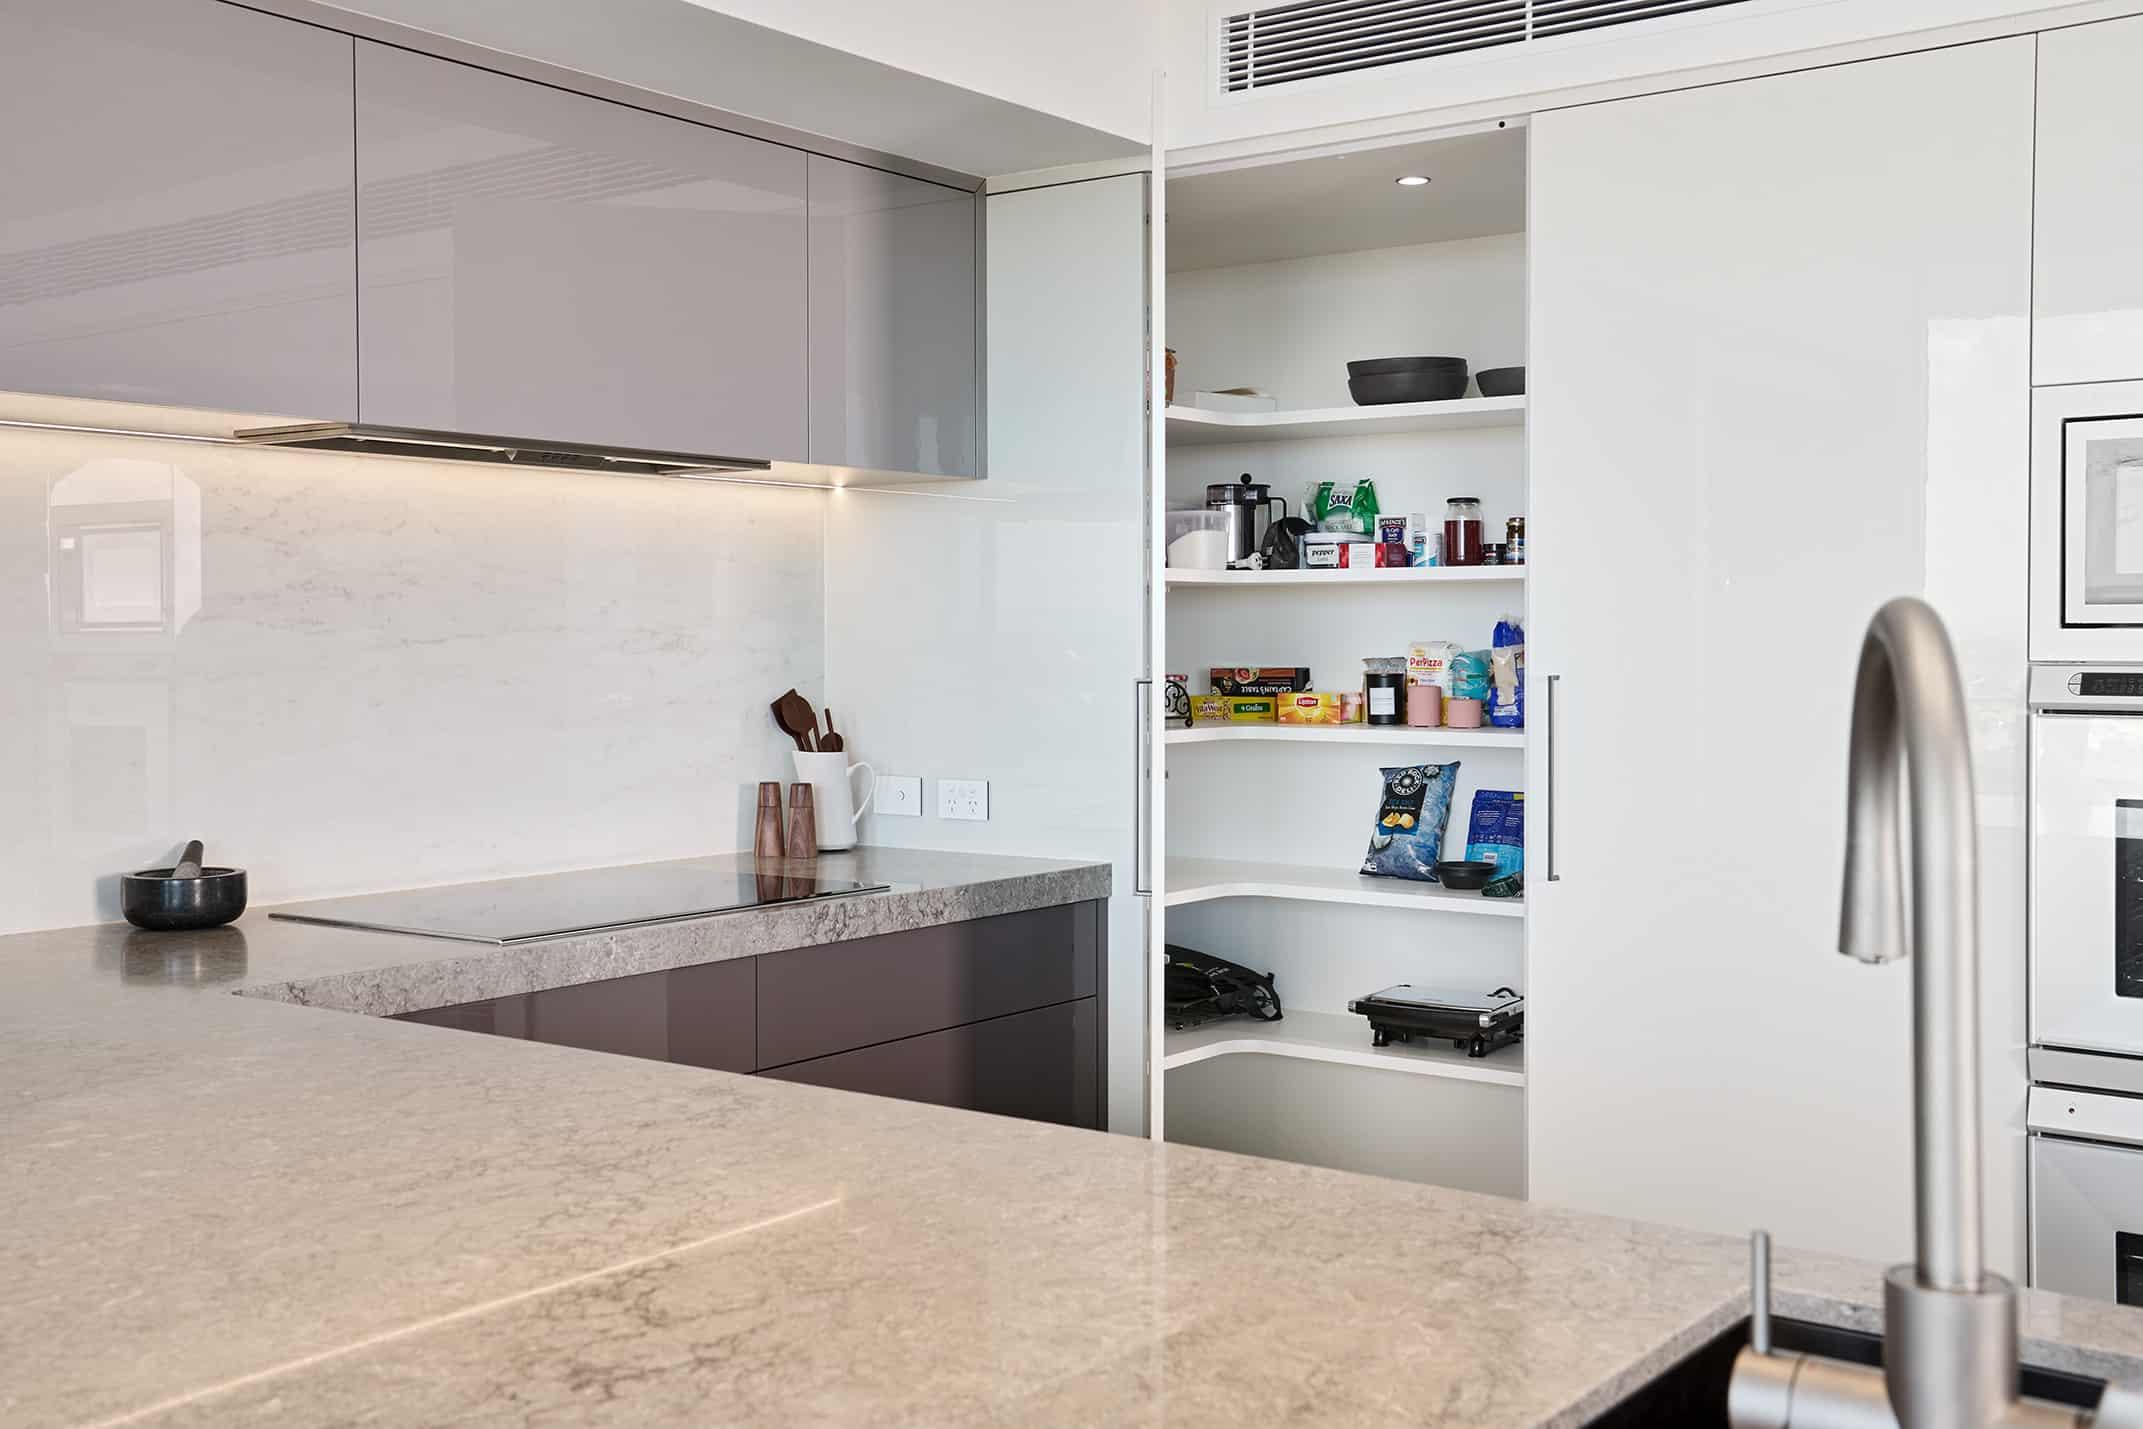 Kitchen walk in pantry open